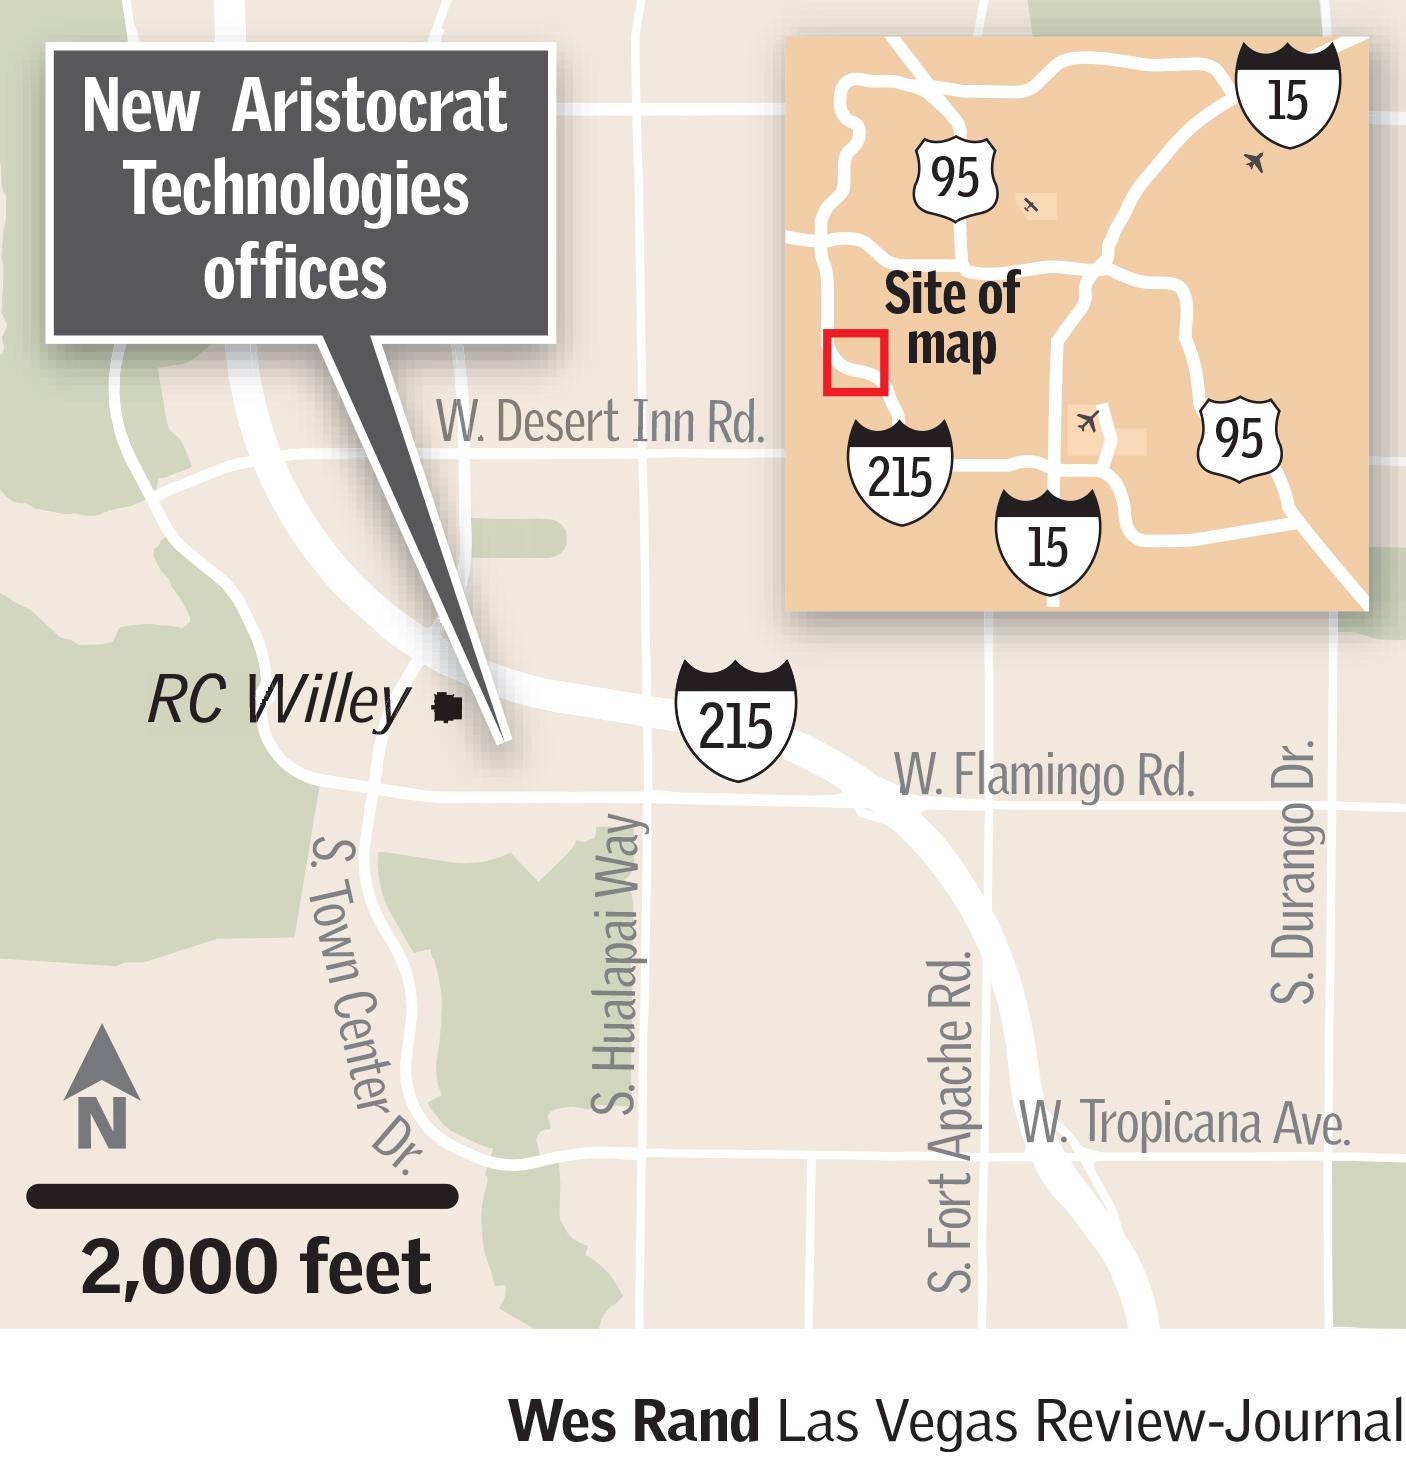 aristocrat (Las Vegas Review-Journal)